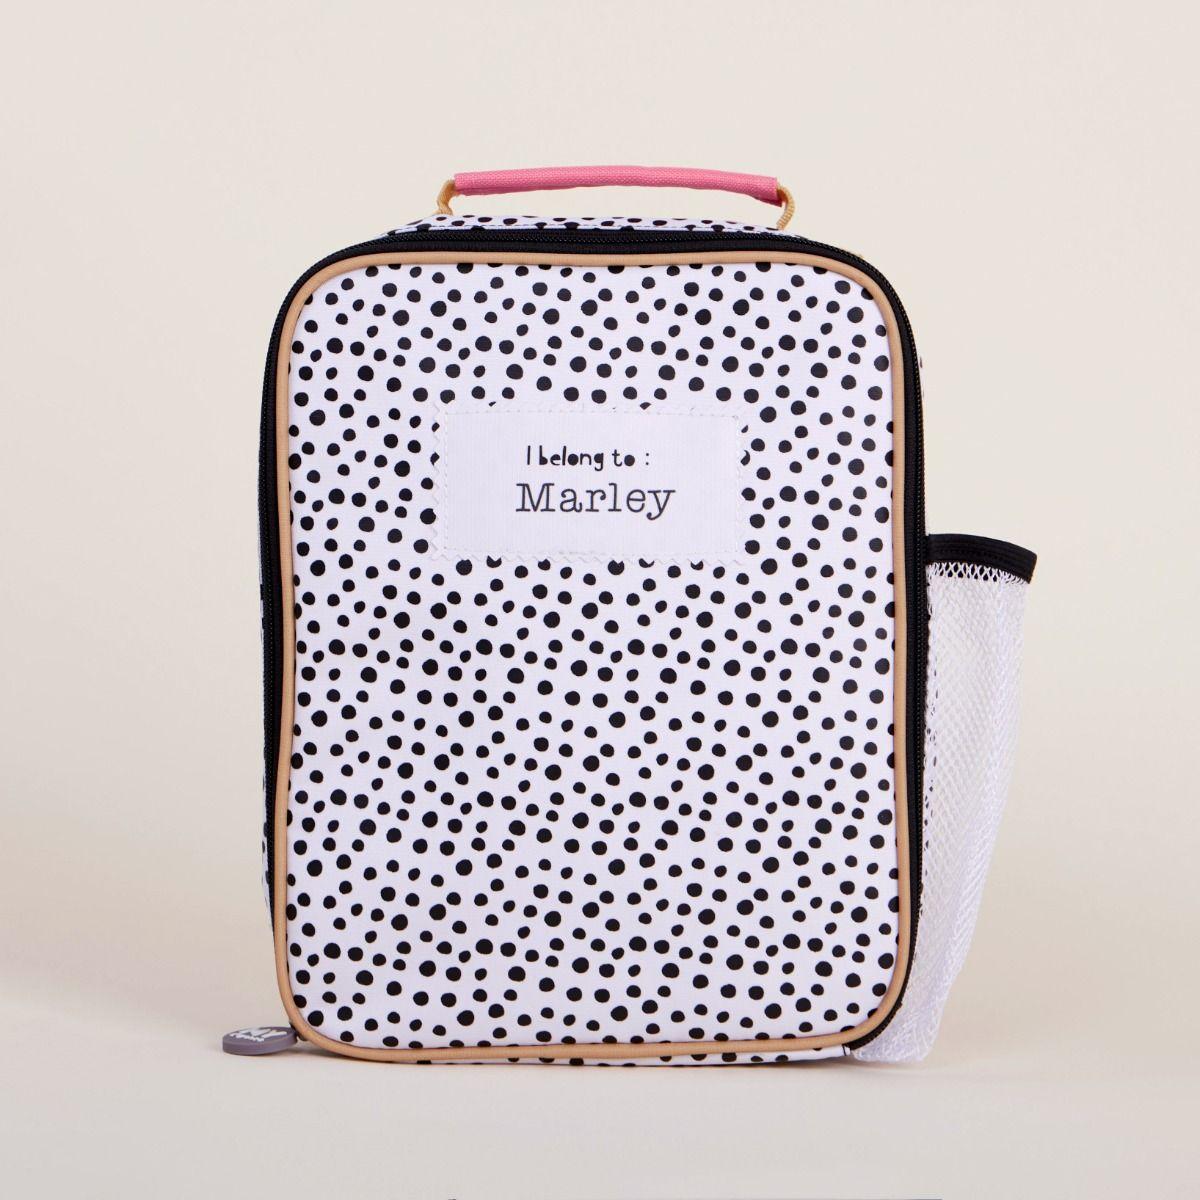 Personalised Polka Dot Lunch Bag